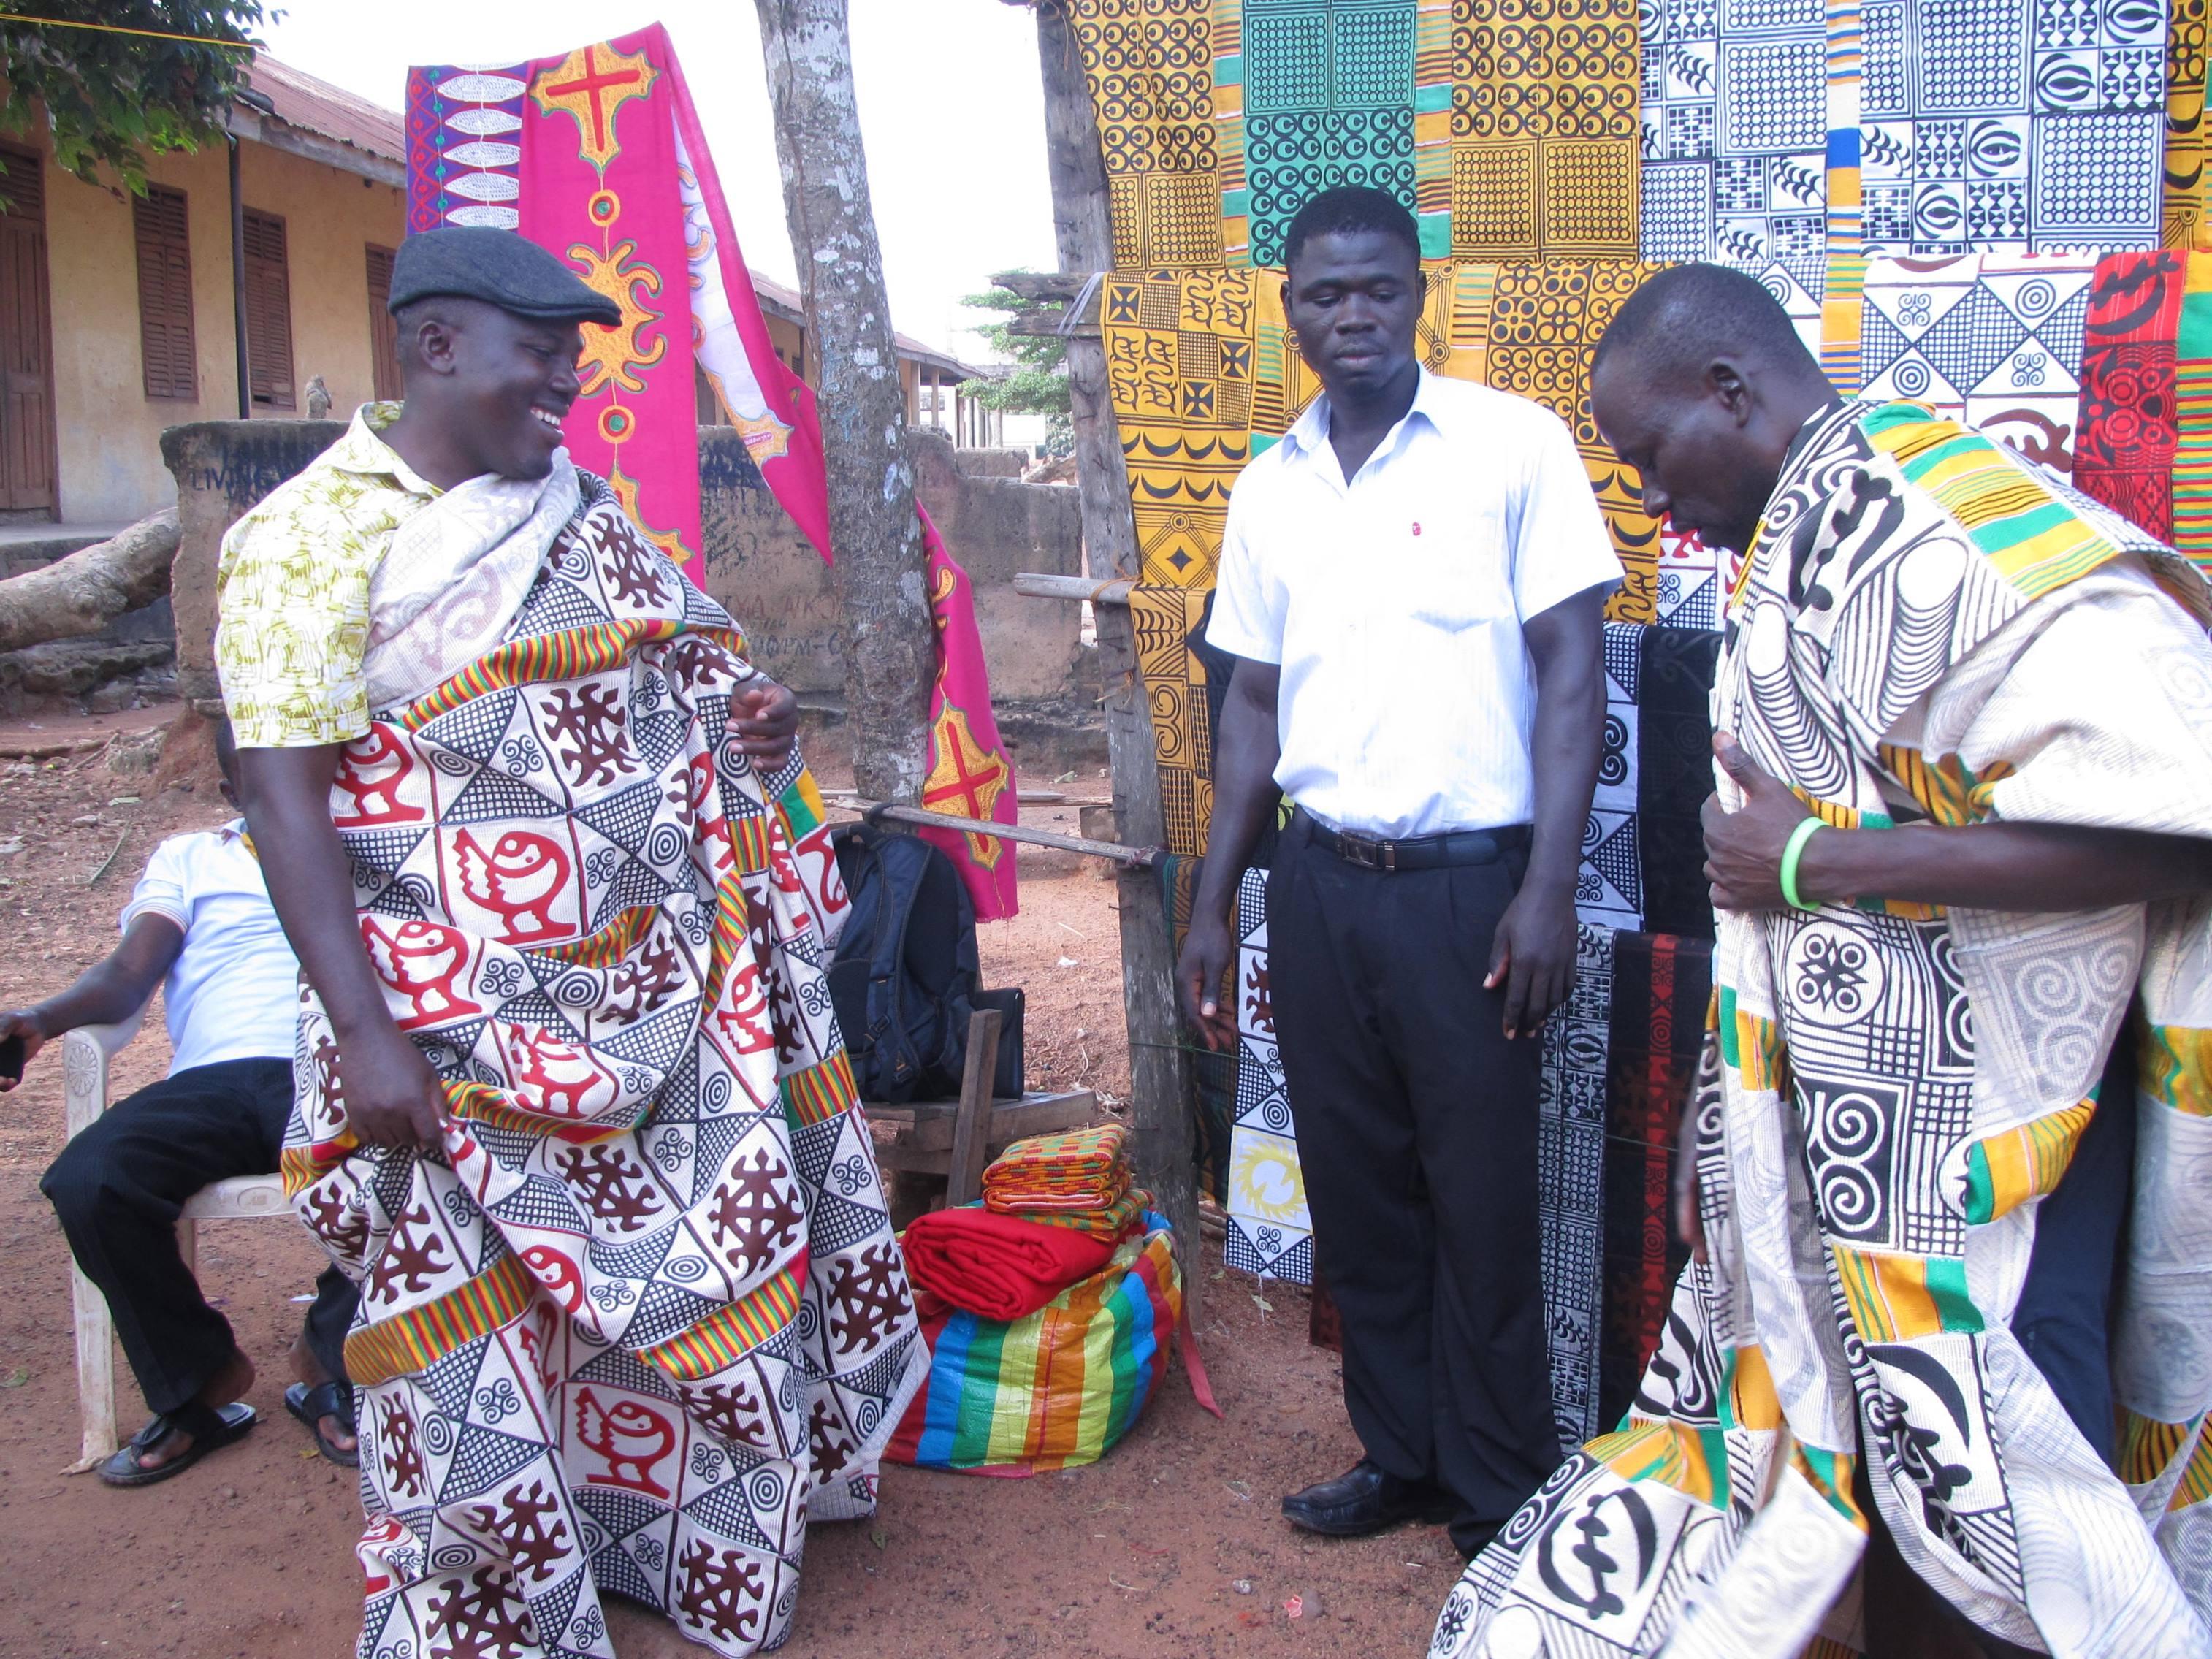 Ghanaian men choosing adinkra textiles